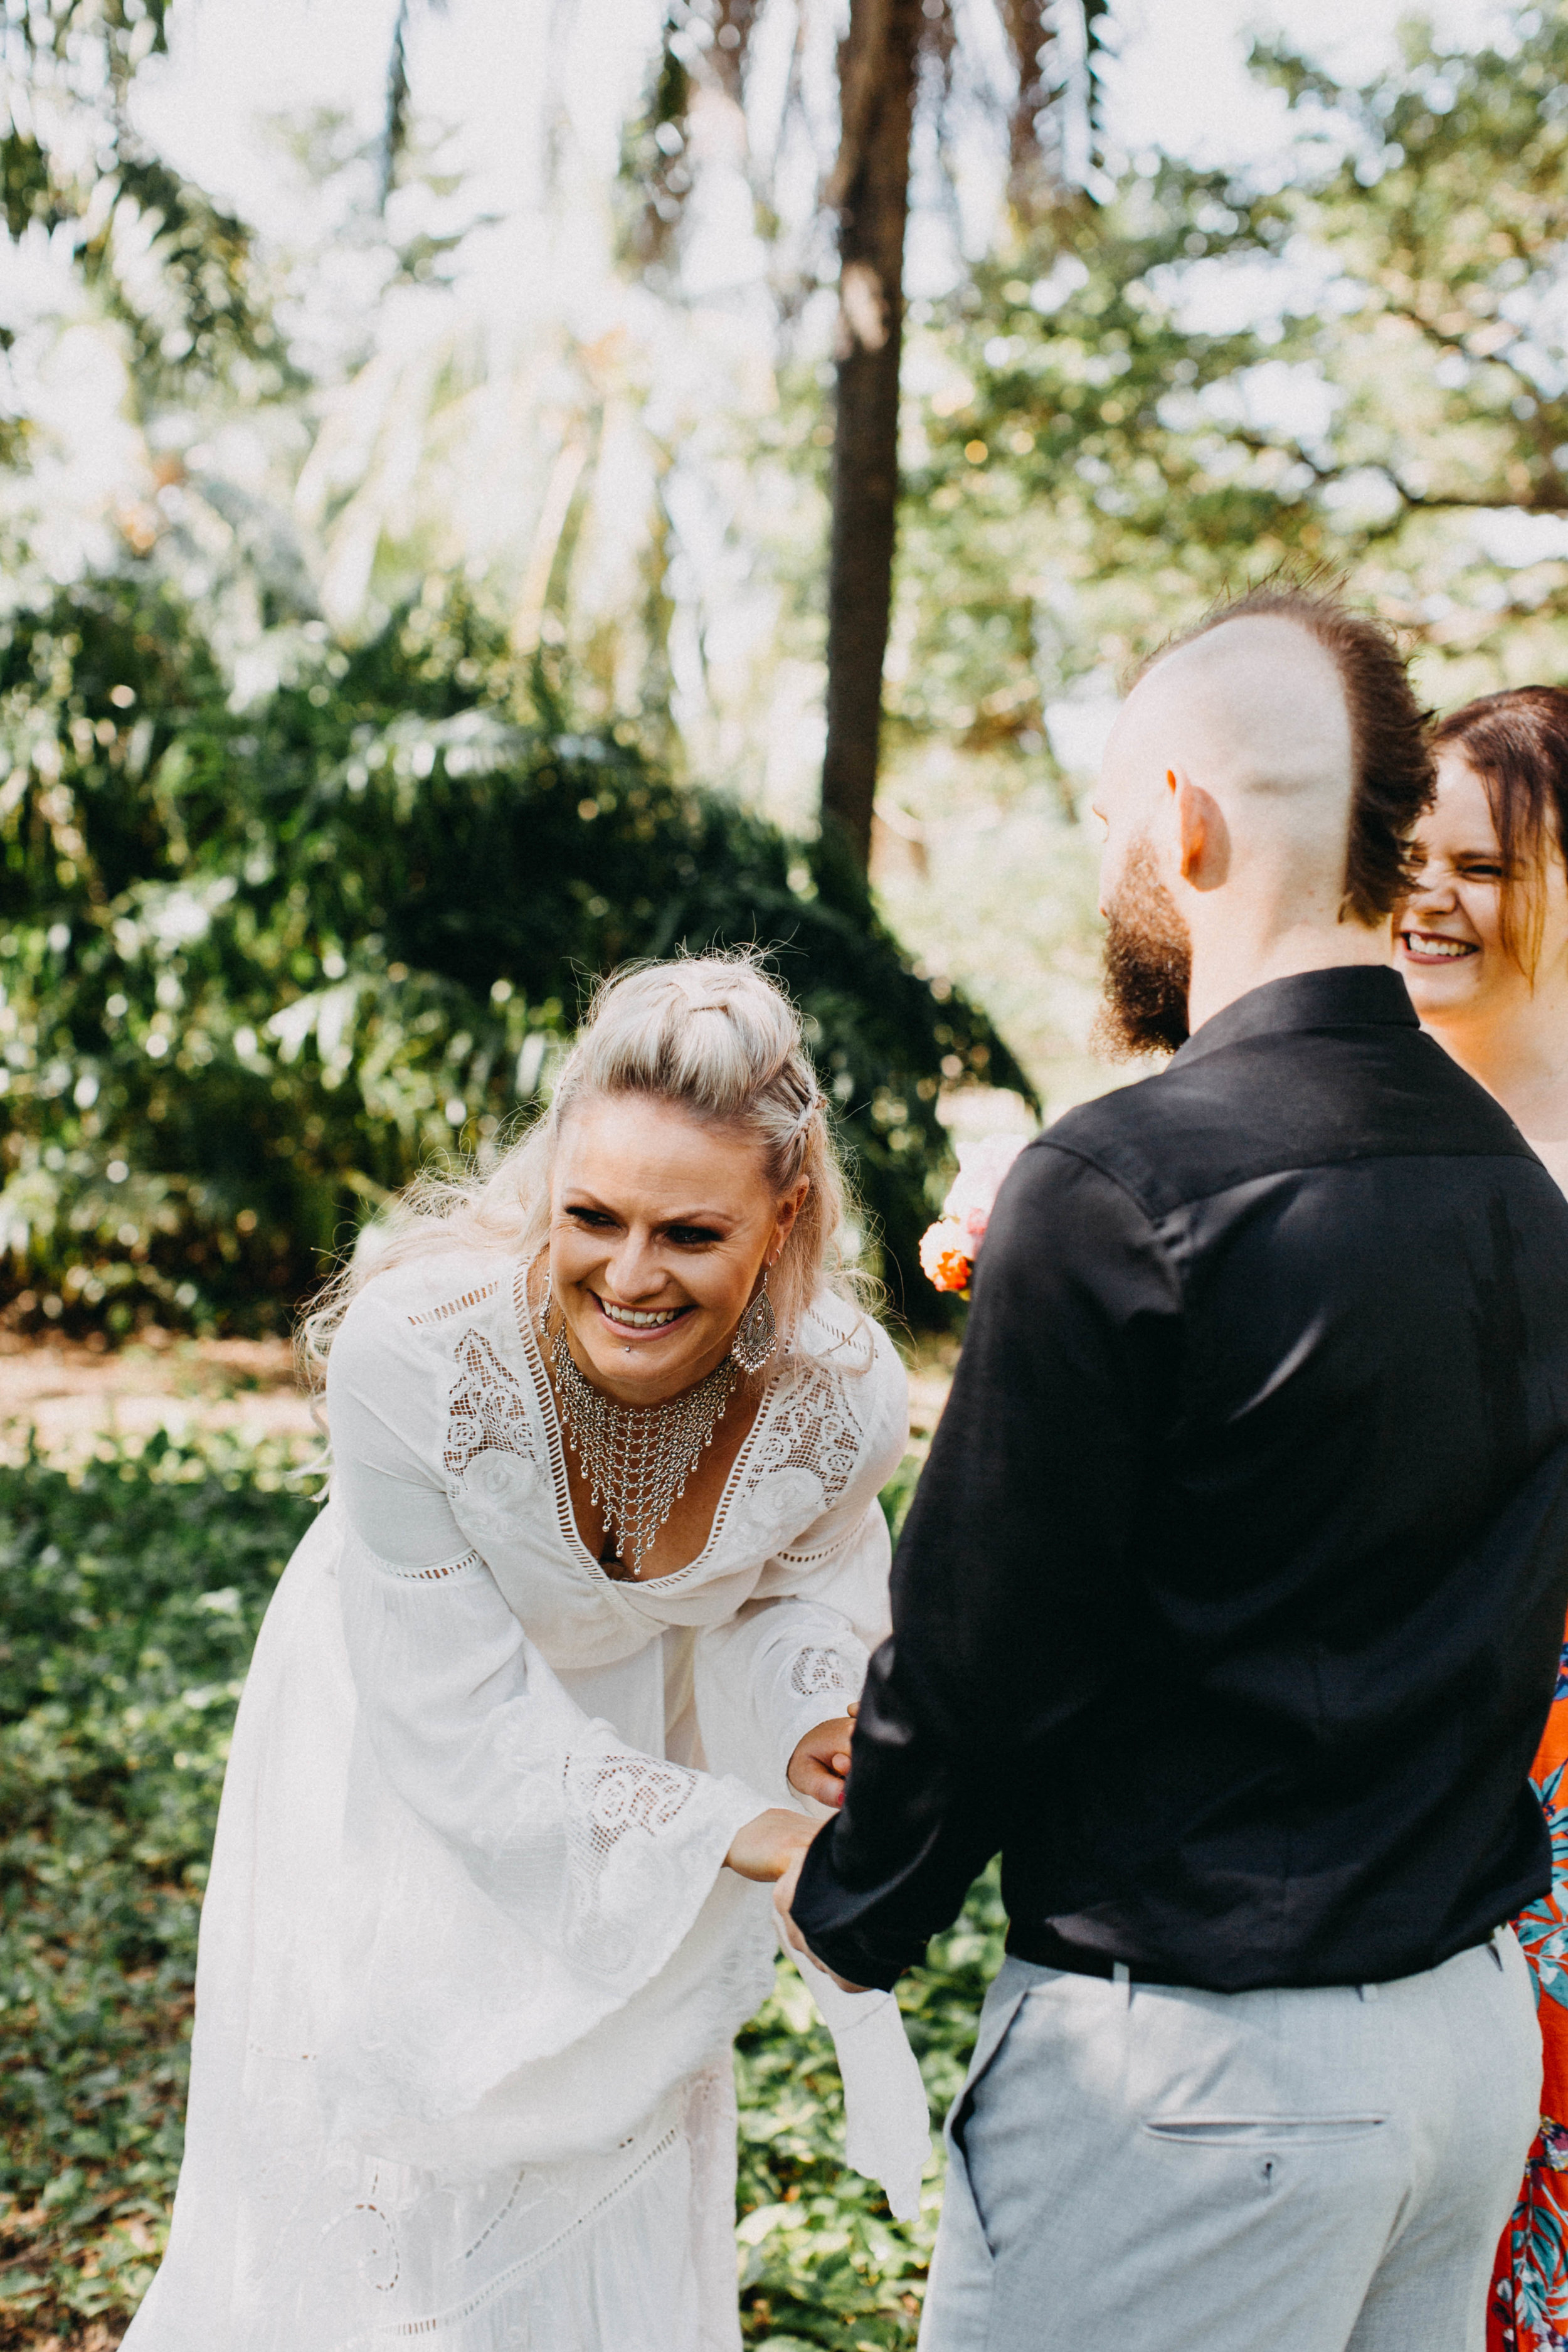 darwin-elopement-wedding-beach-camden-photography-www.emilyobrienphotography.net-14.jpg